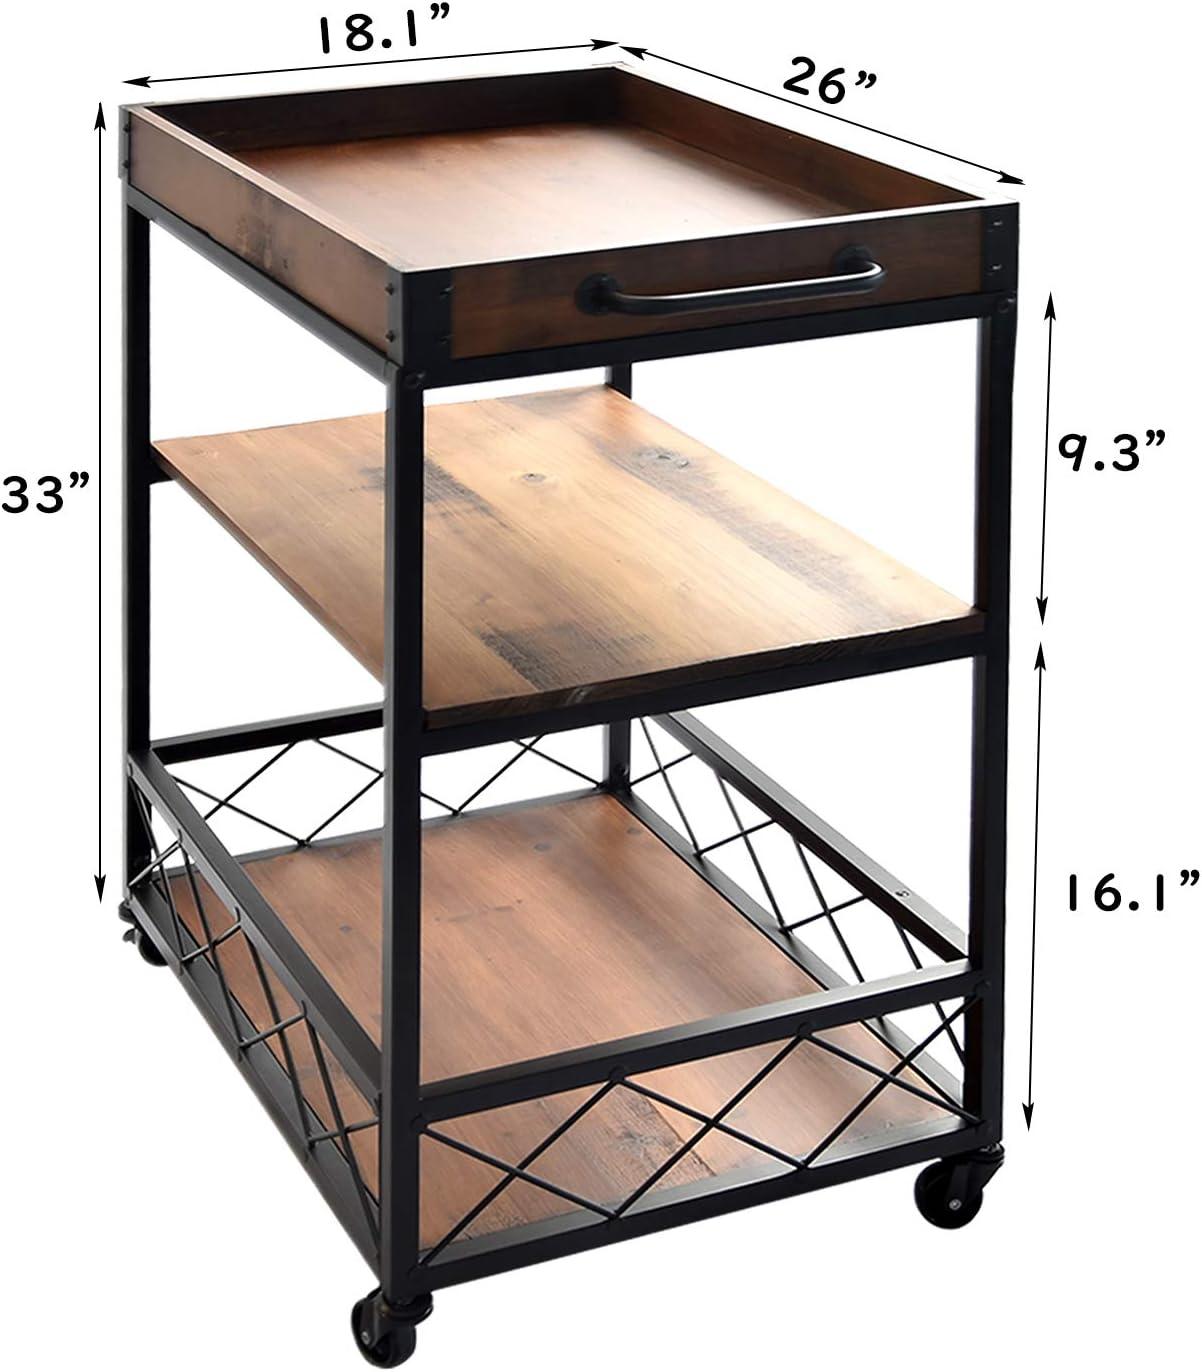 Rolling Kitchen cart Brown CharaVector Kitchen cart with 3 -Tier Shelves Practical Industrial Kitchen Bar/&Serving Cart,Metal Wine Rack Storage and Glass Bottle Holder